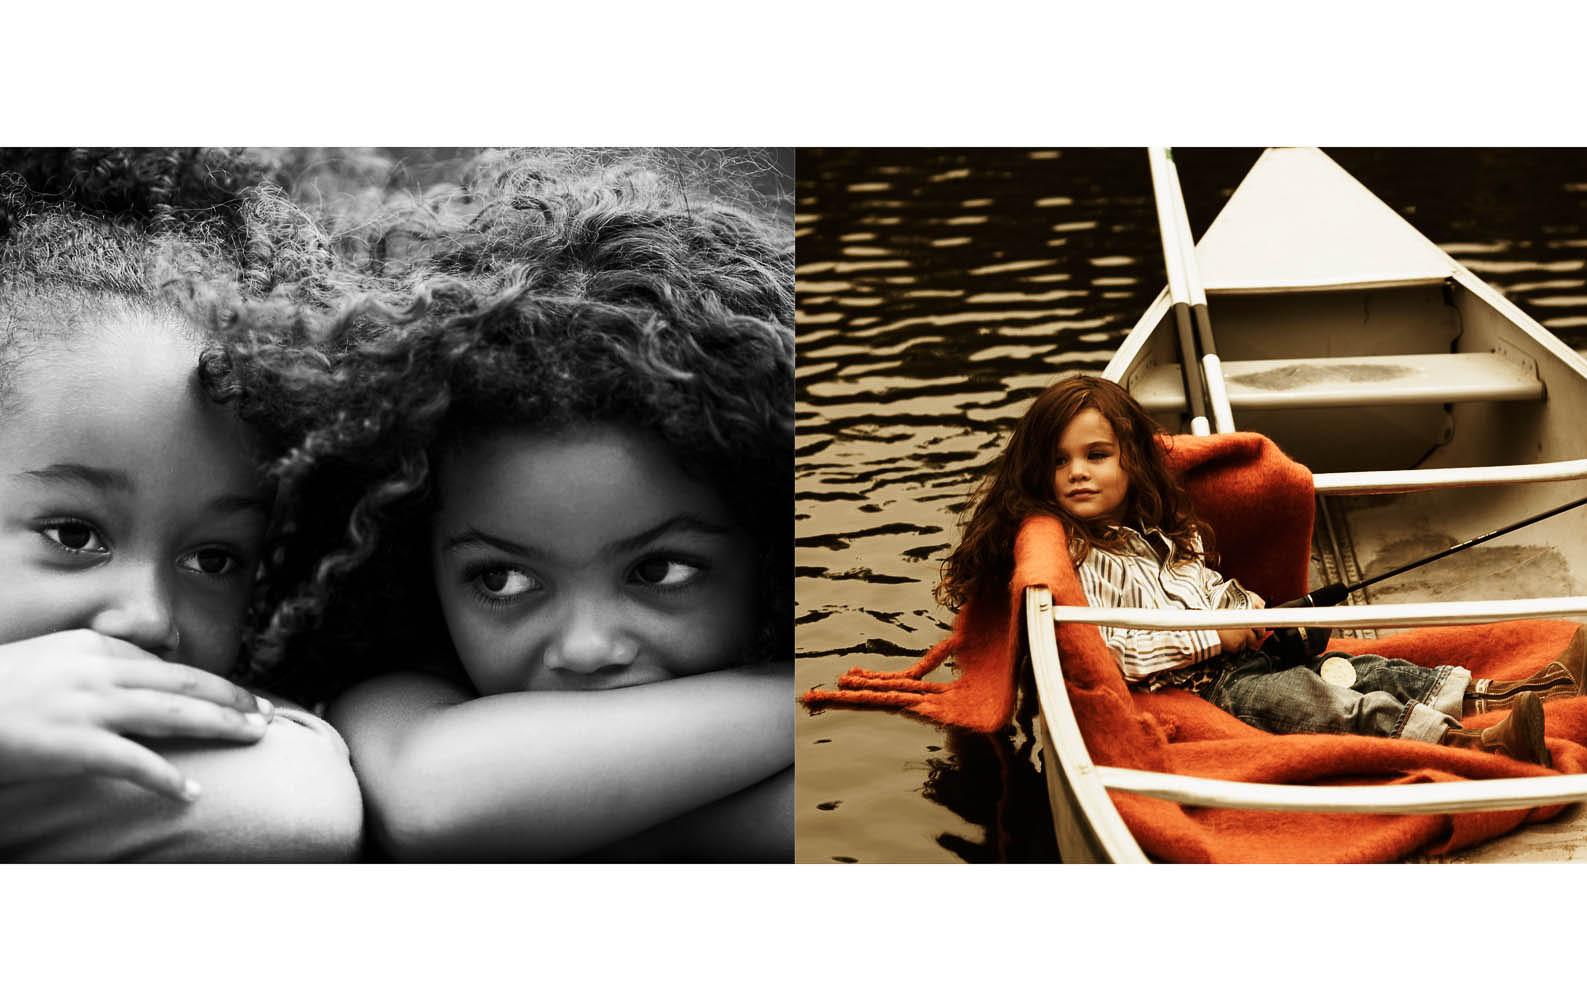 Photograph - Photomontage